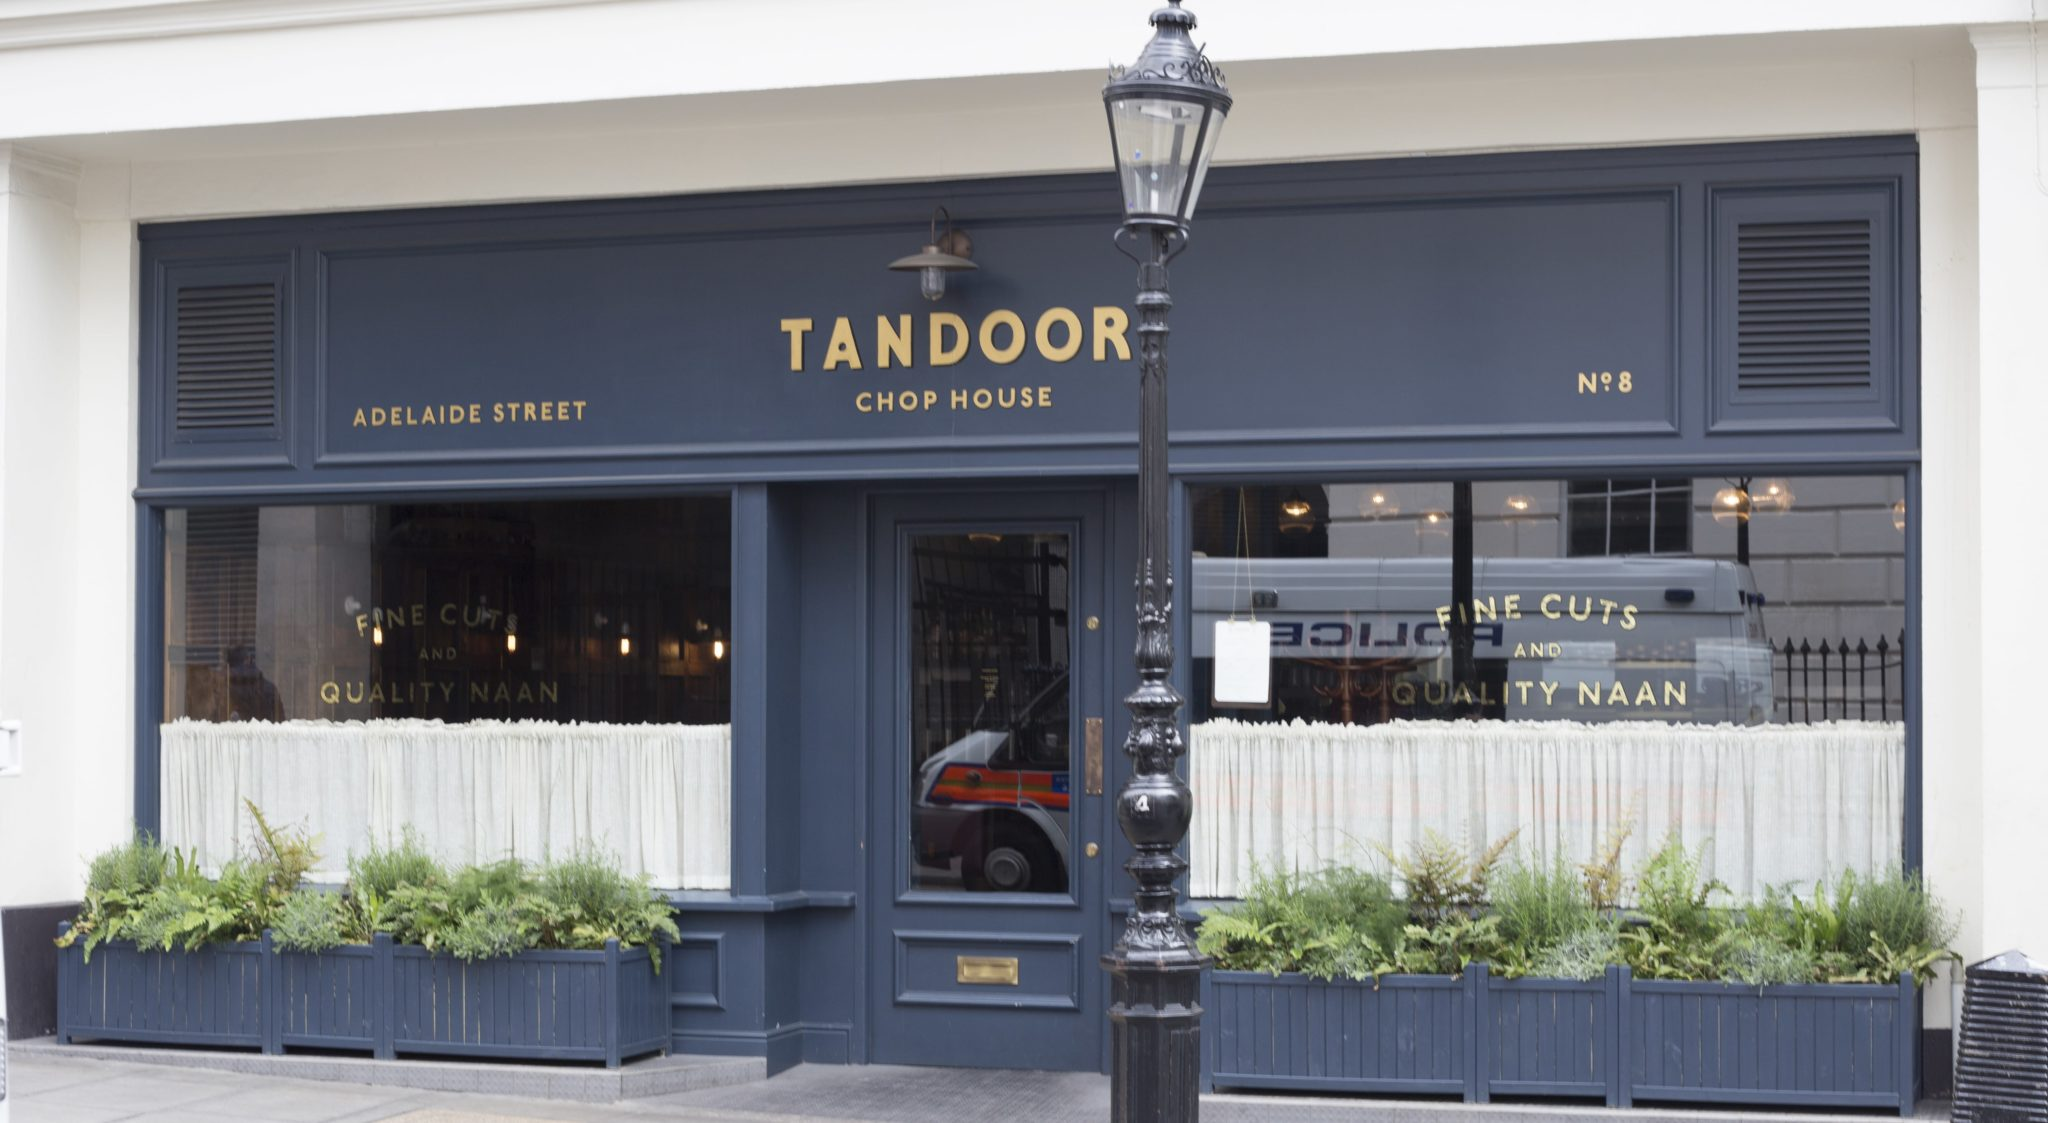 Tandoor Chop House finediningindian visit april 16th_1-min